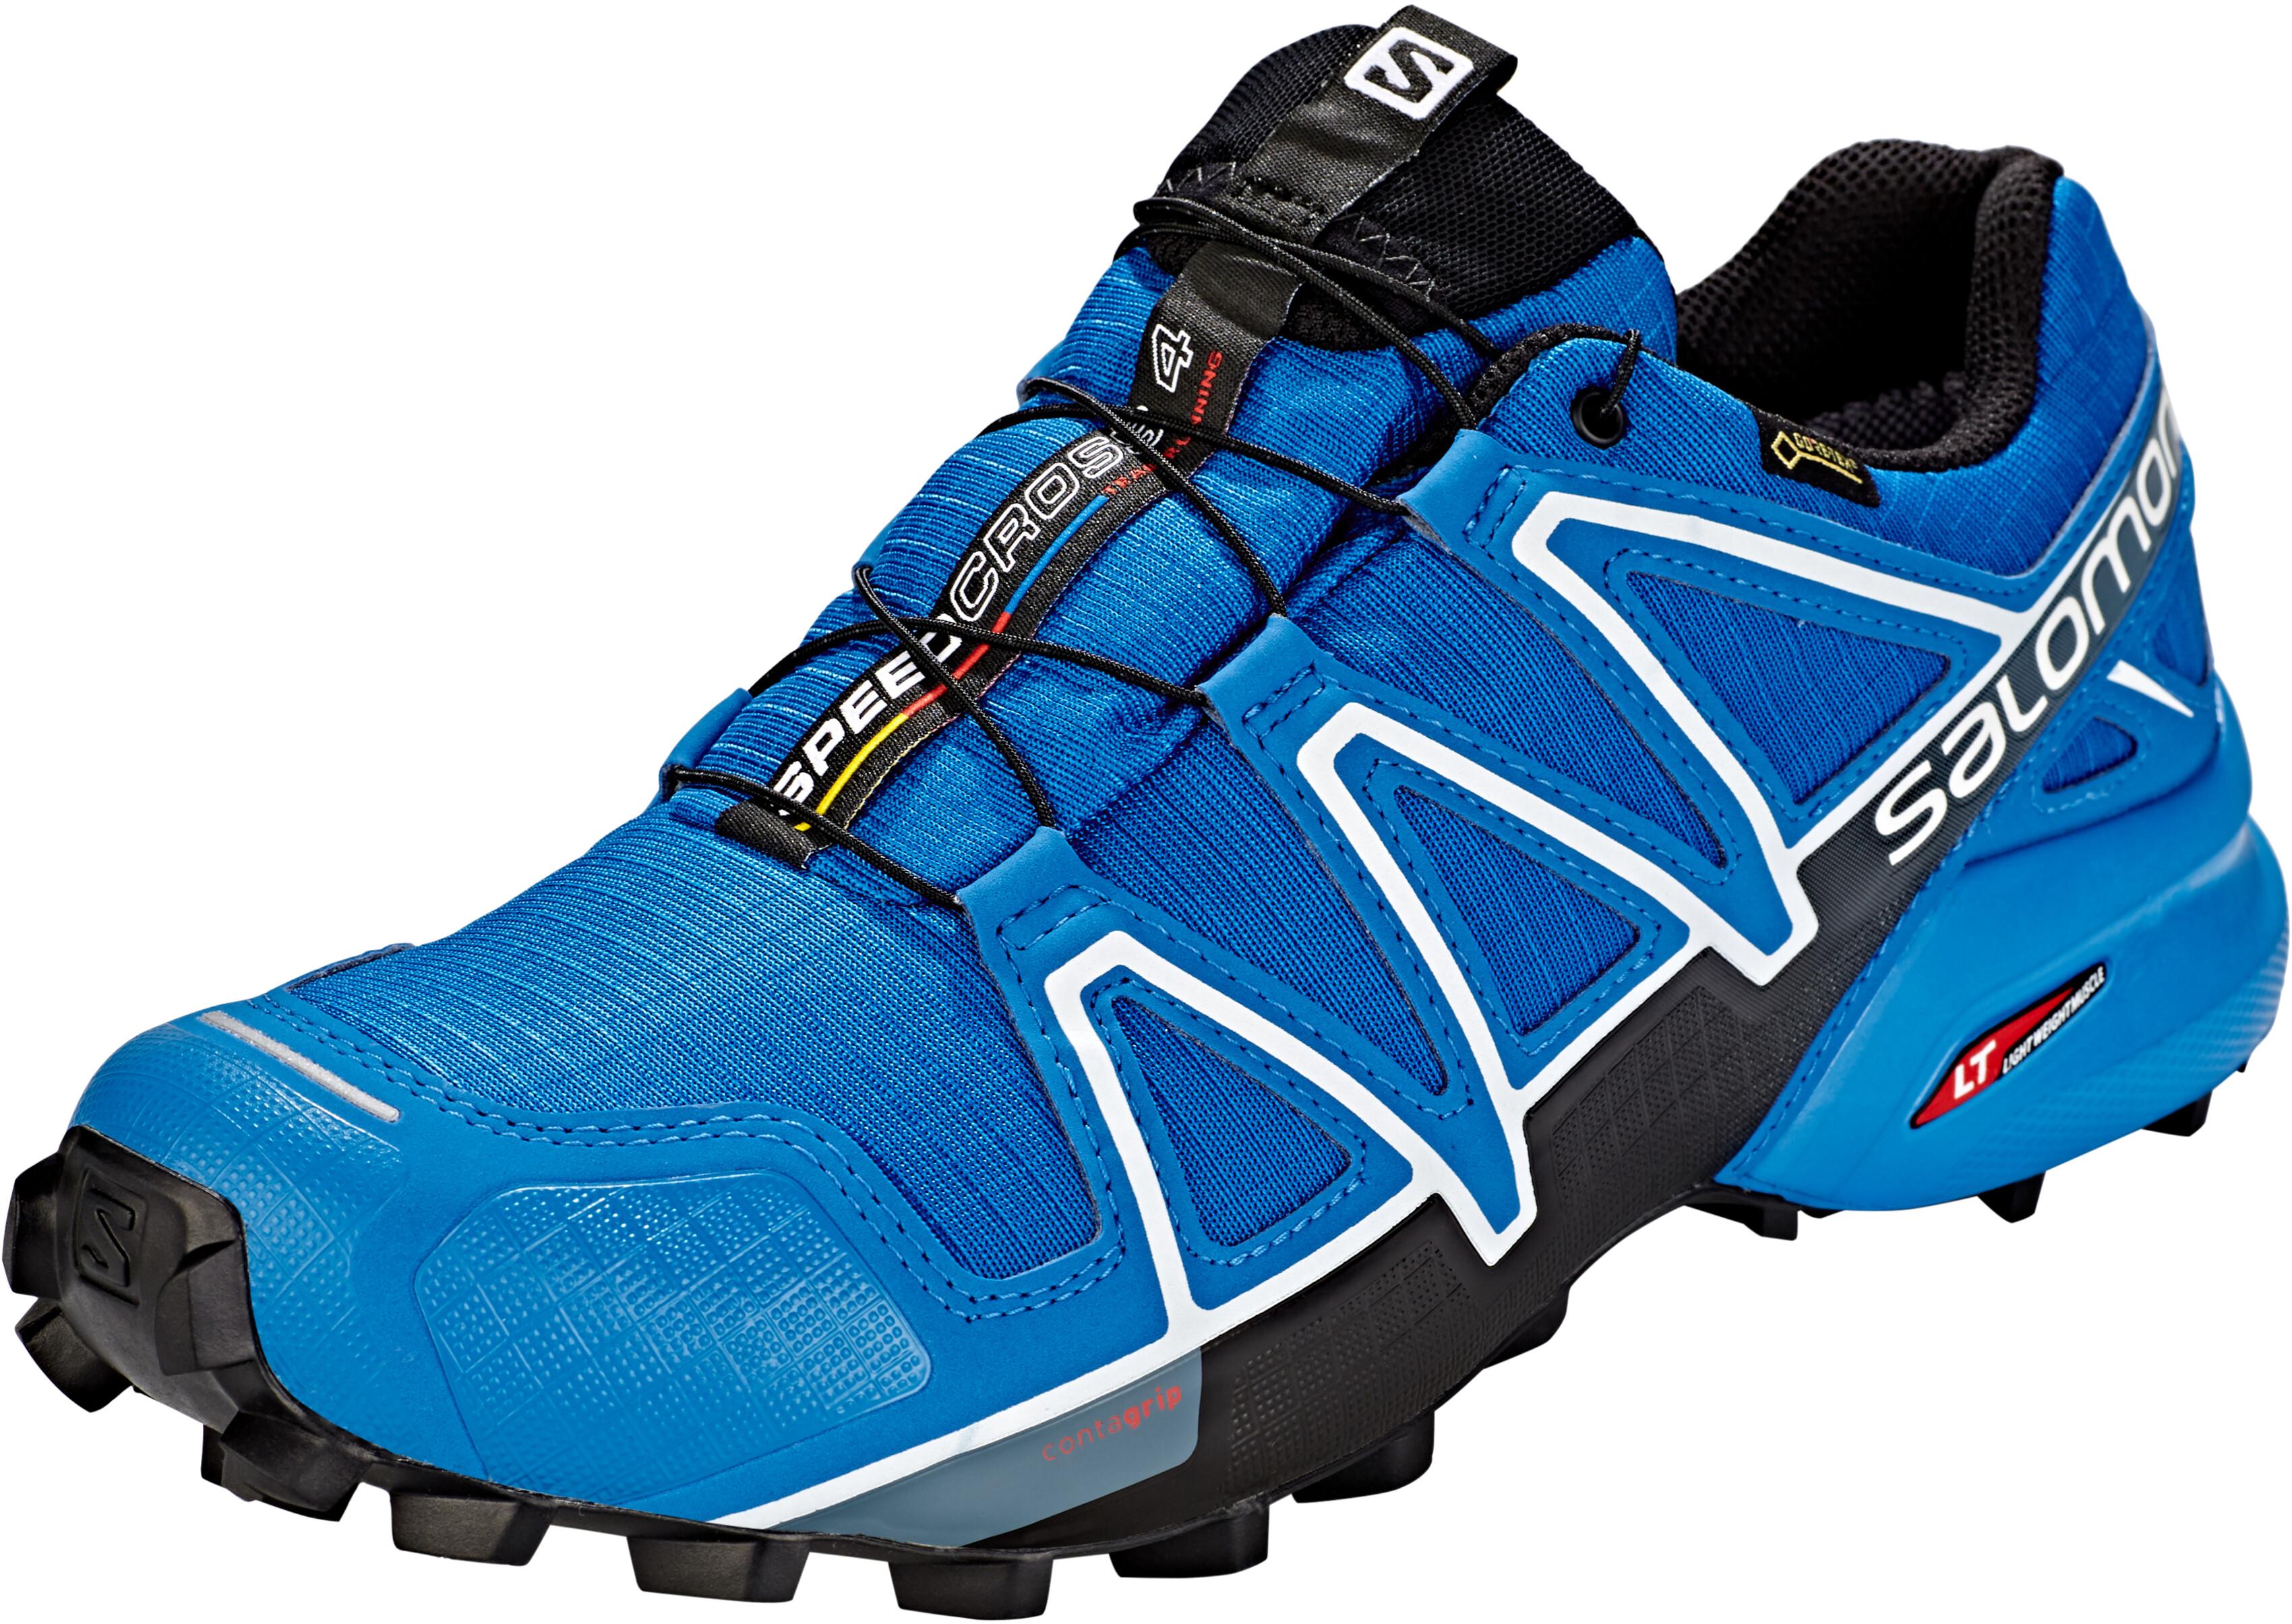 a348f5b5cfc Salomon Speedcross 4 GTX Shoes Men sky diver/indigo bunting/black at ...